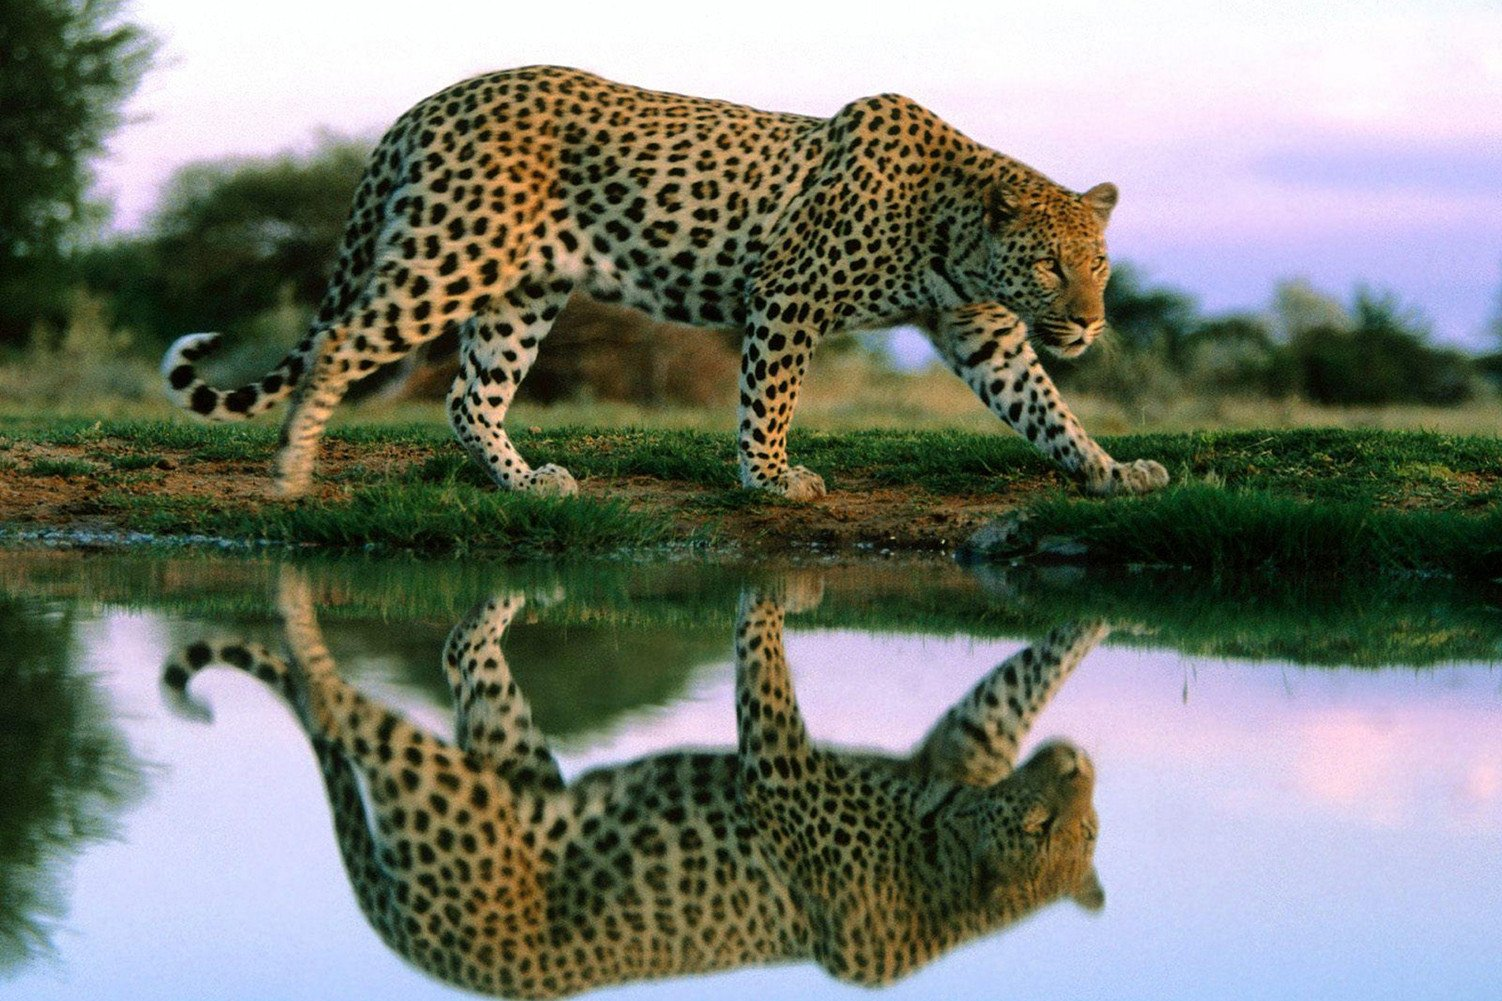 CHOIS Custom Film CF3321 Animal Leopard Glass Window Privacy Frosted DIY Sticker 3' W by 2' H